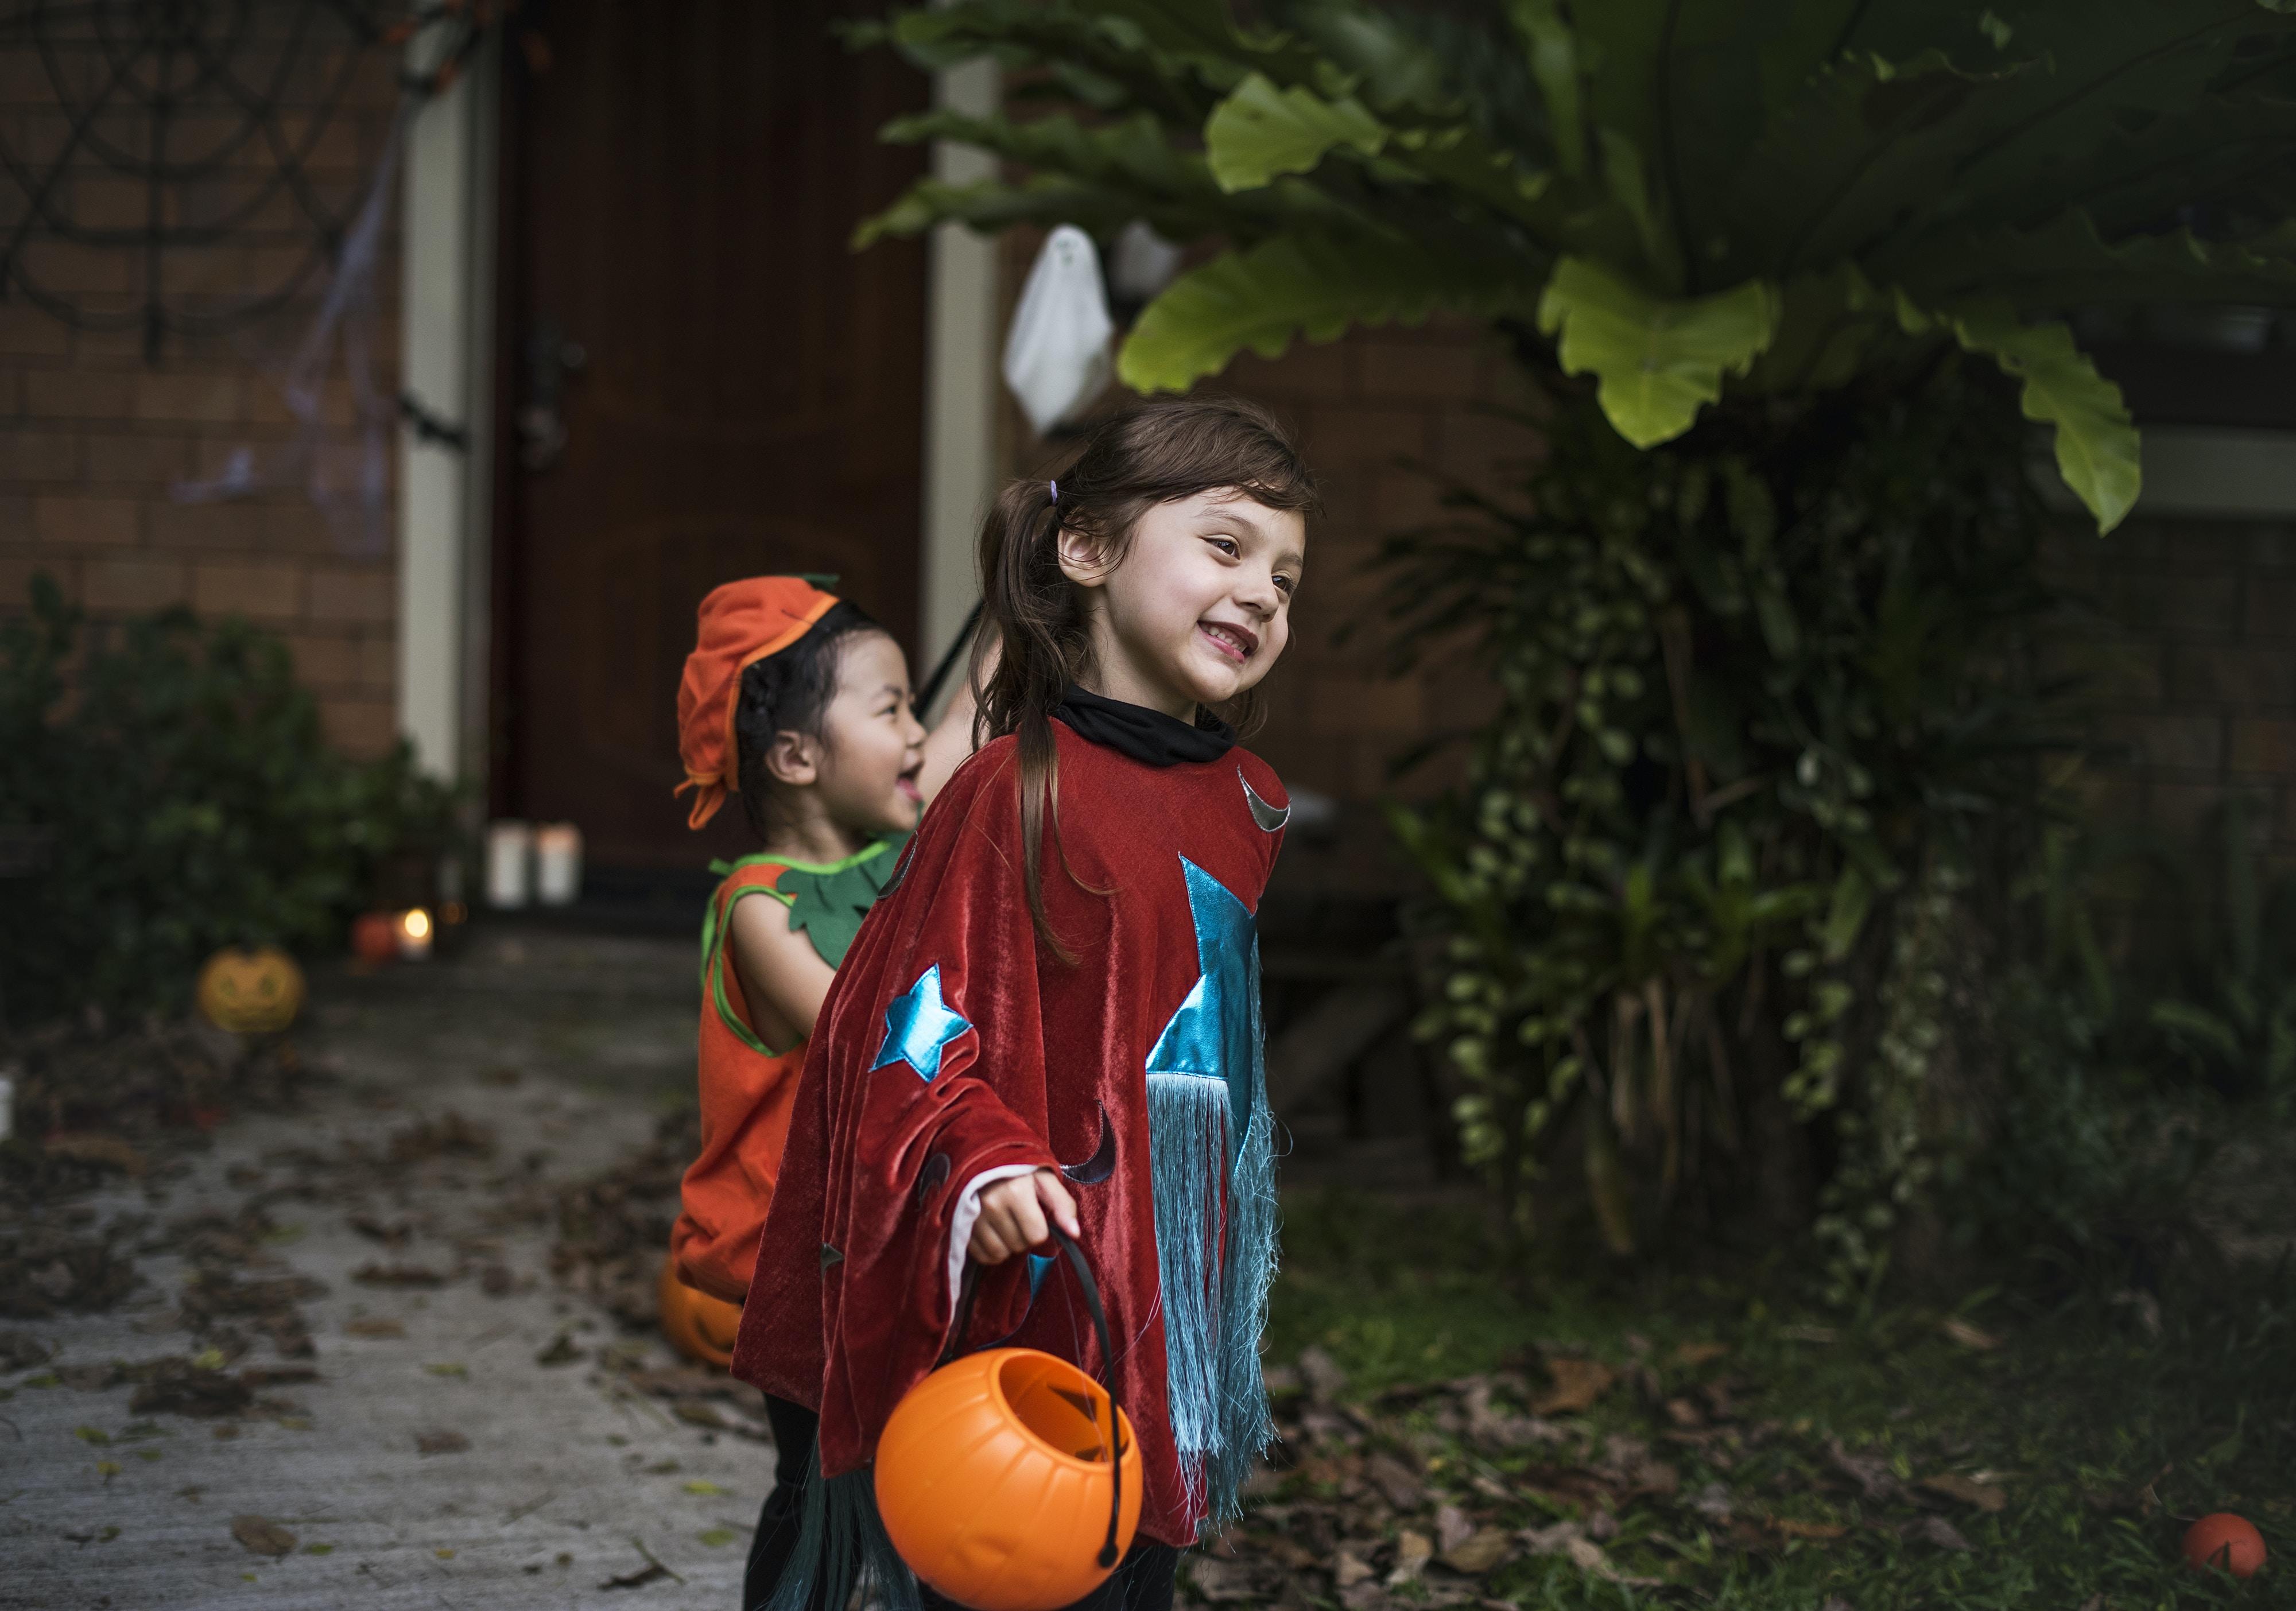 girl holding Jack-o-lantern basket smiling